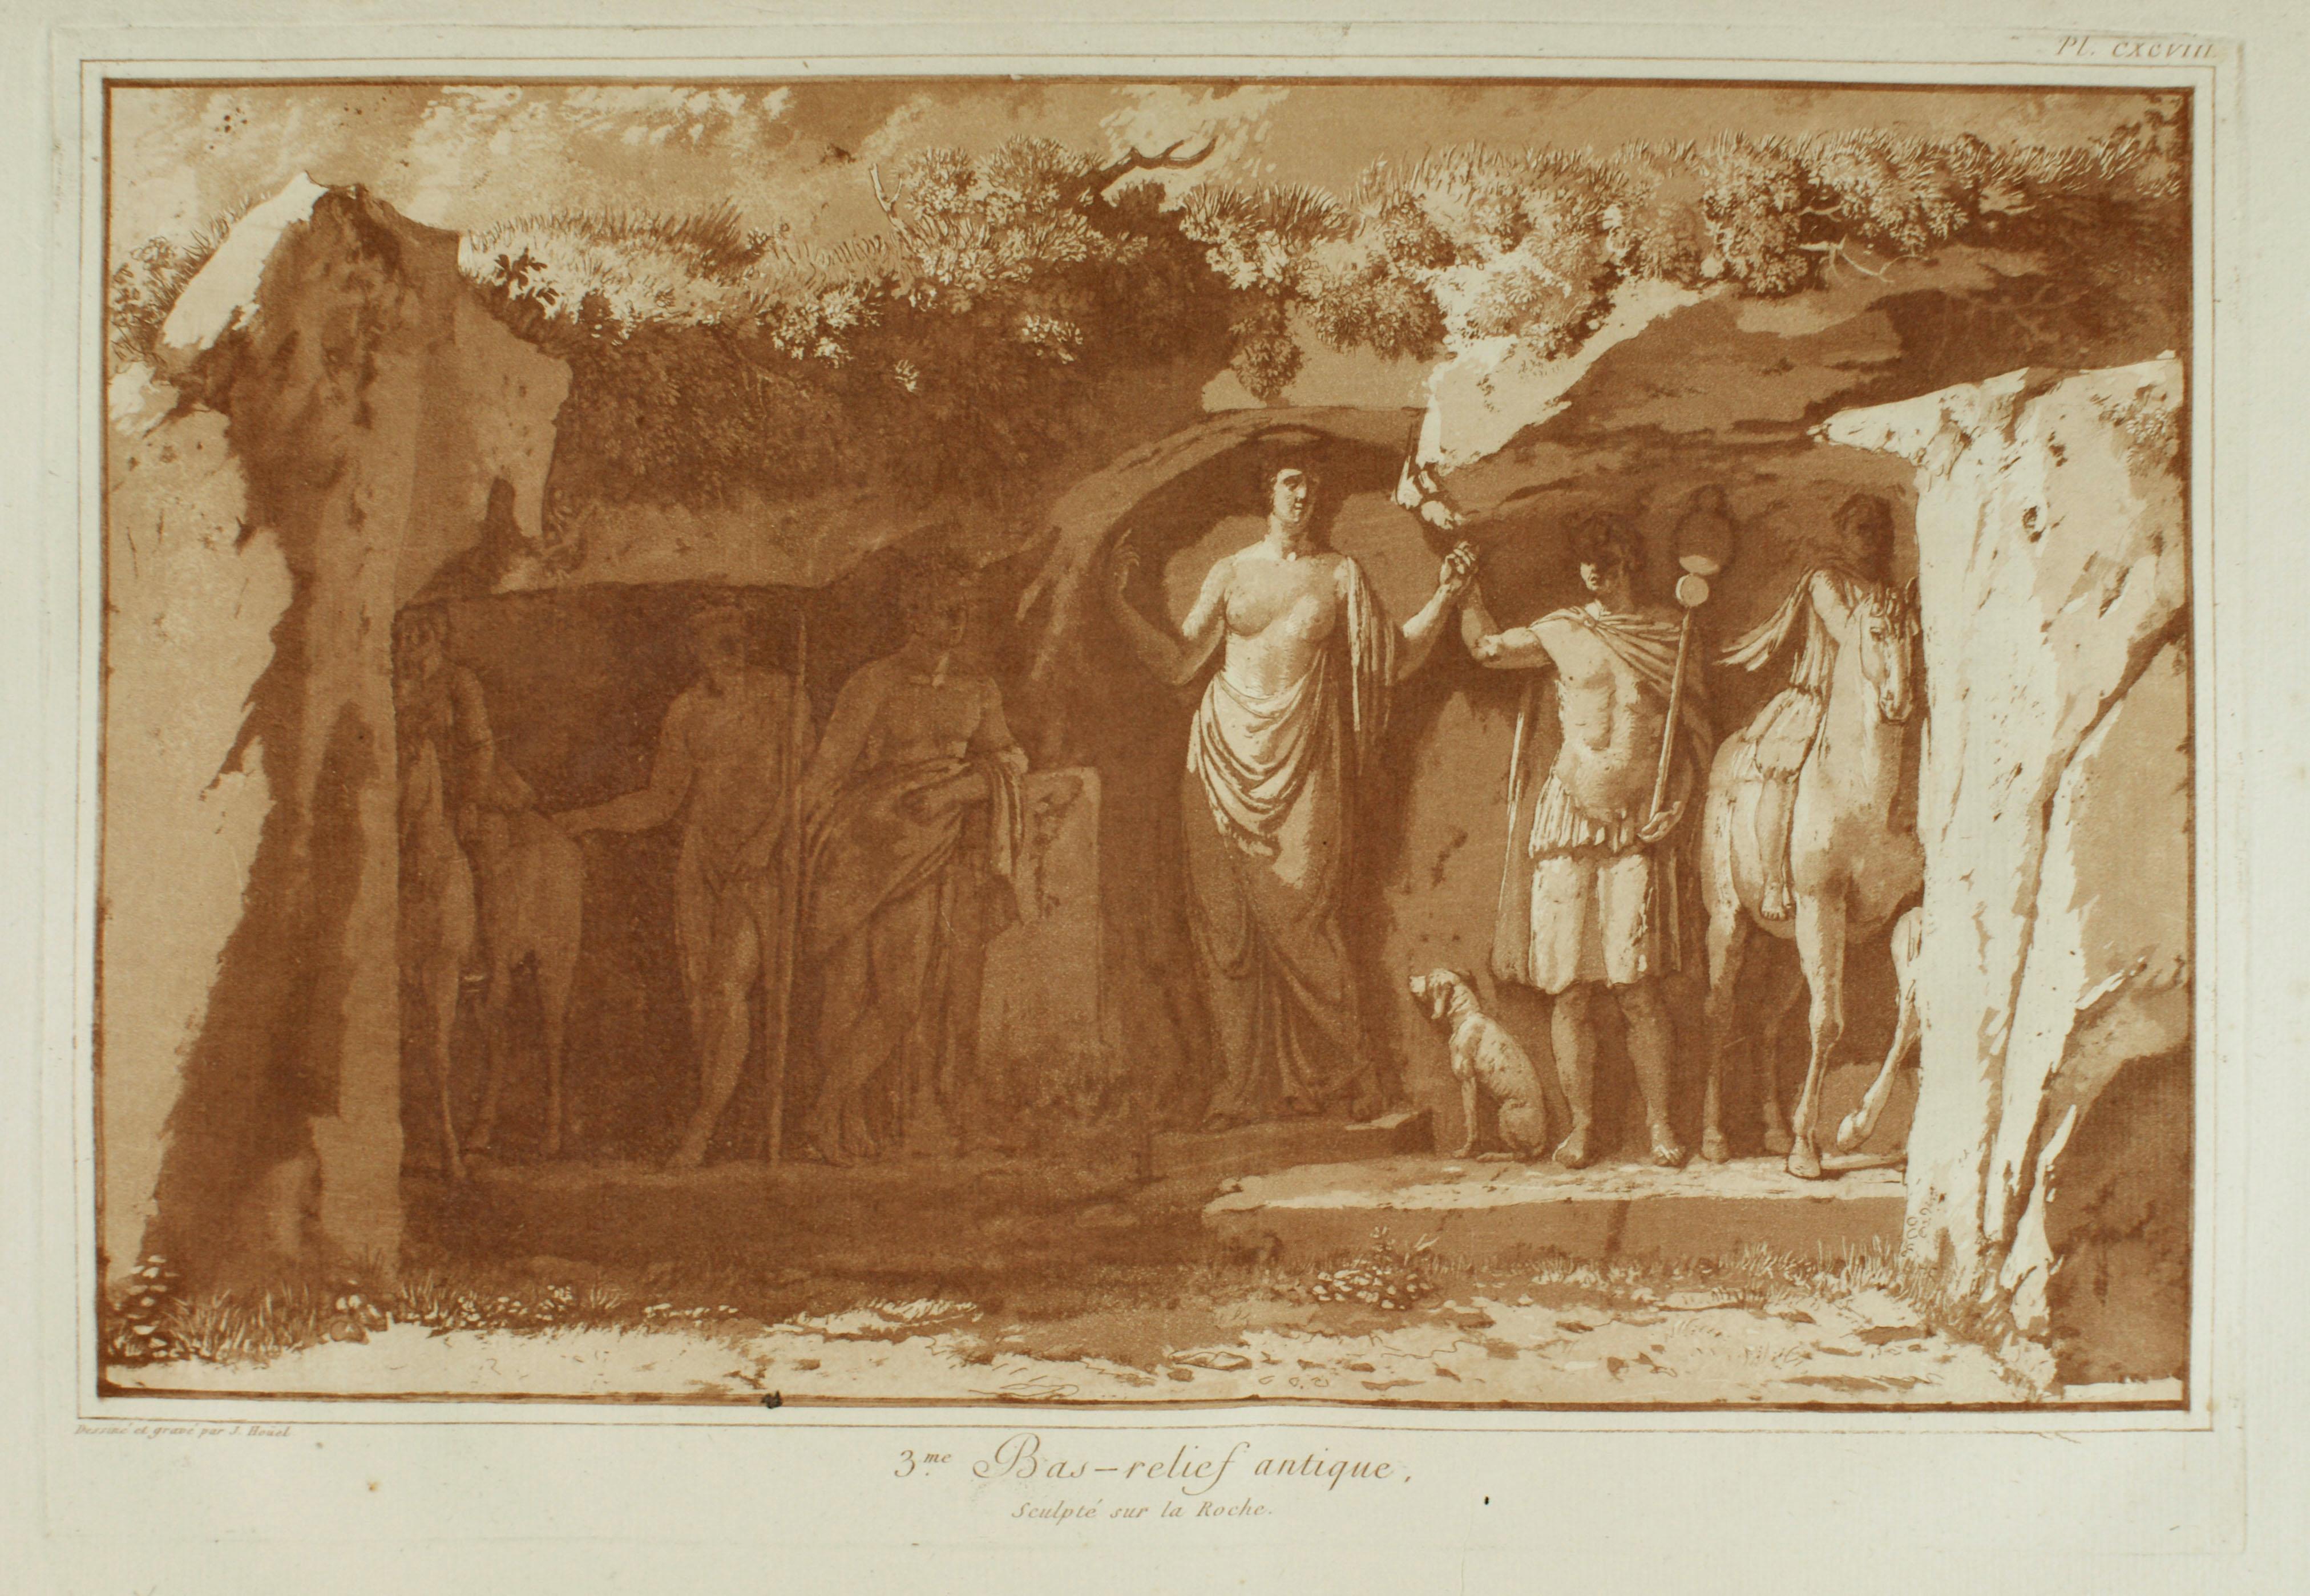 Houel, Voyage Pittoresque, Vol. III, 1785, Tavola 198